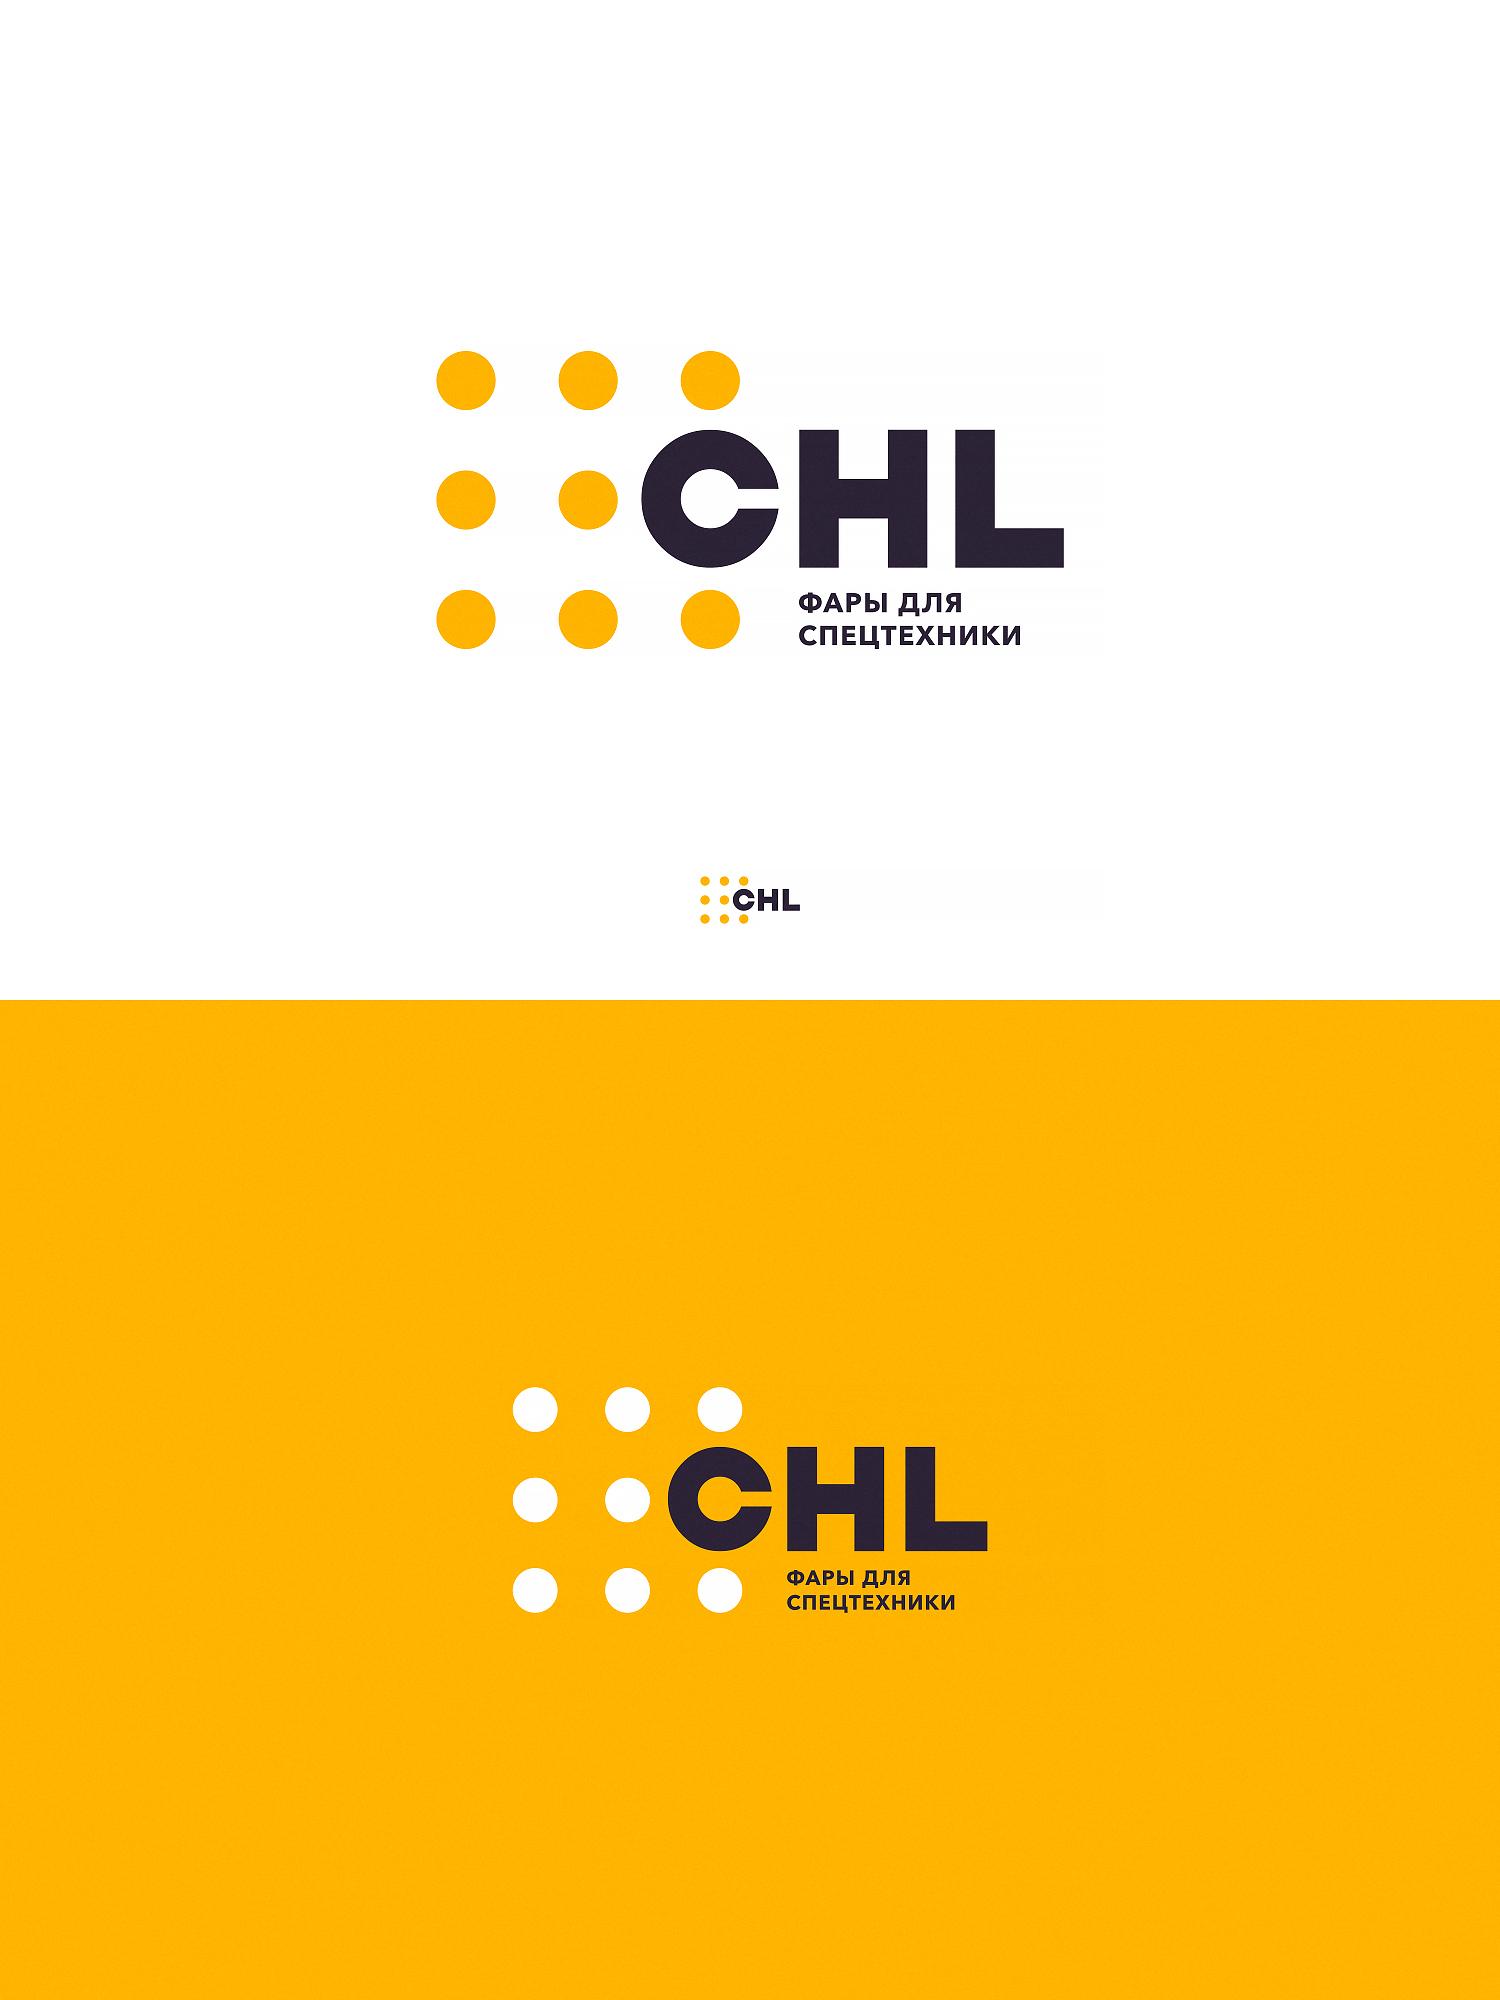 разработка логотипа для производителя фар фото f_9775f5ad00c59396.jpg